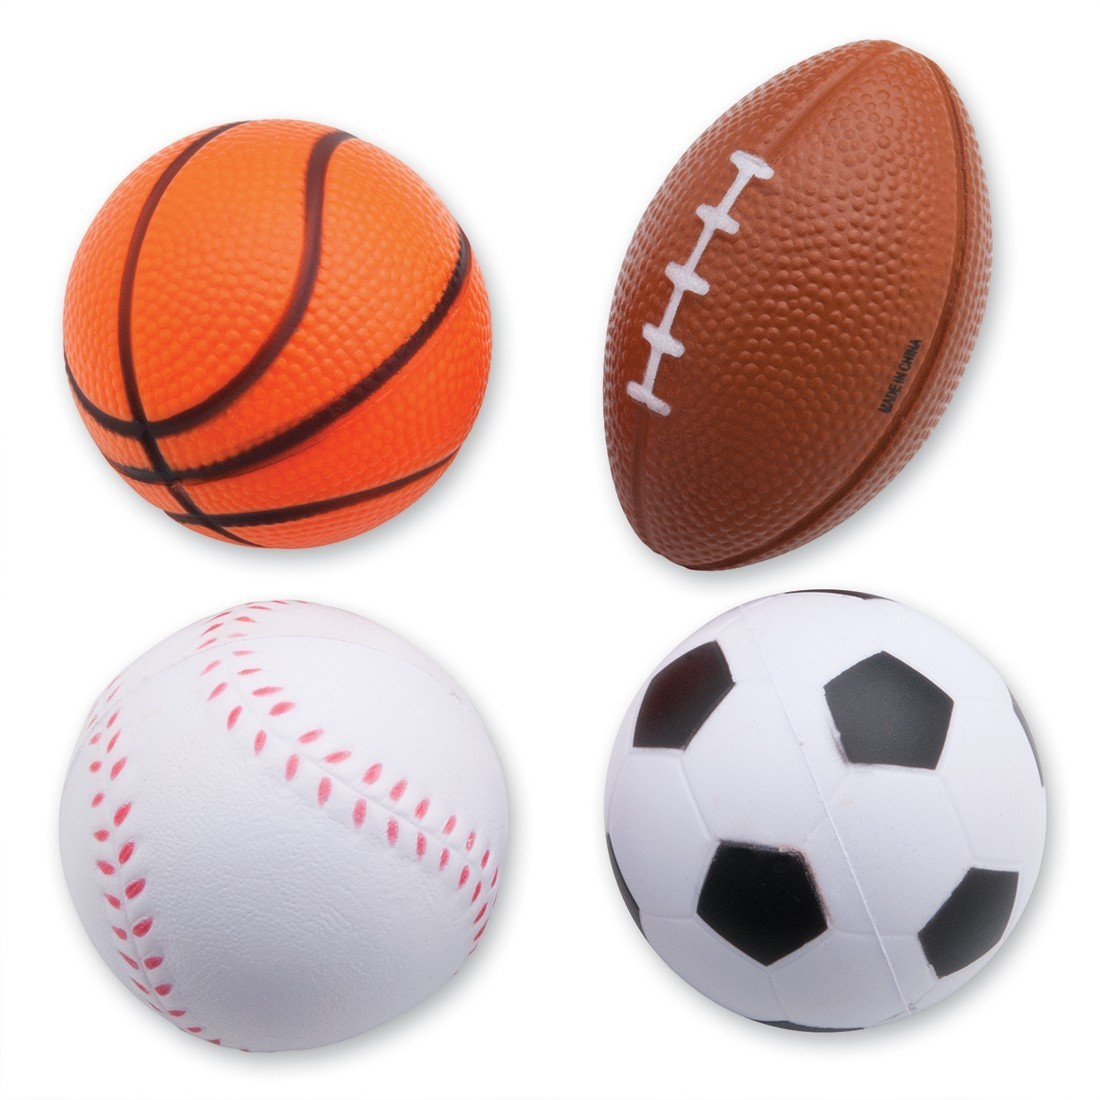 Sports Stress Balls [image]